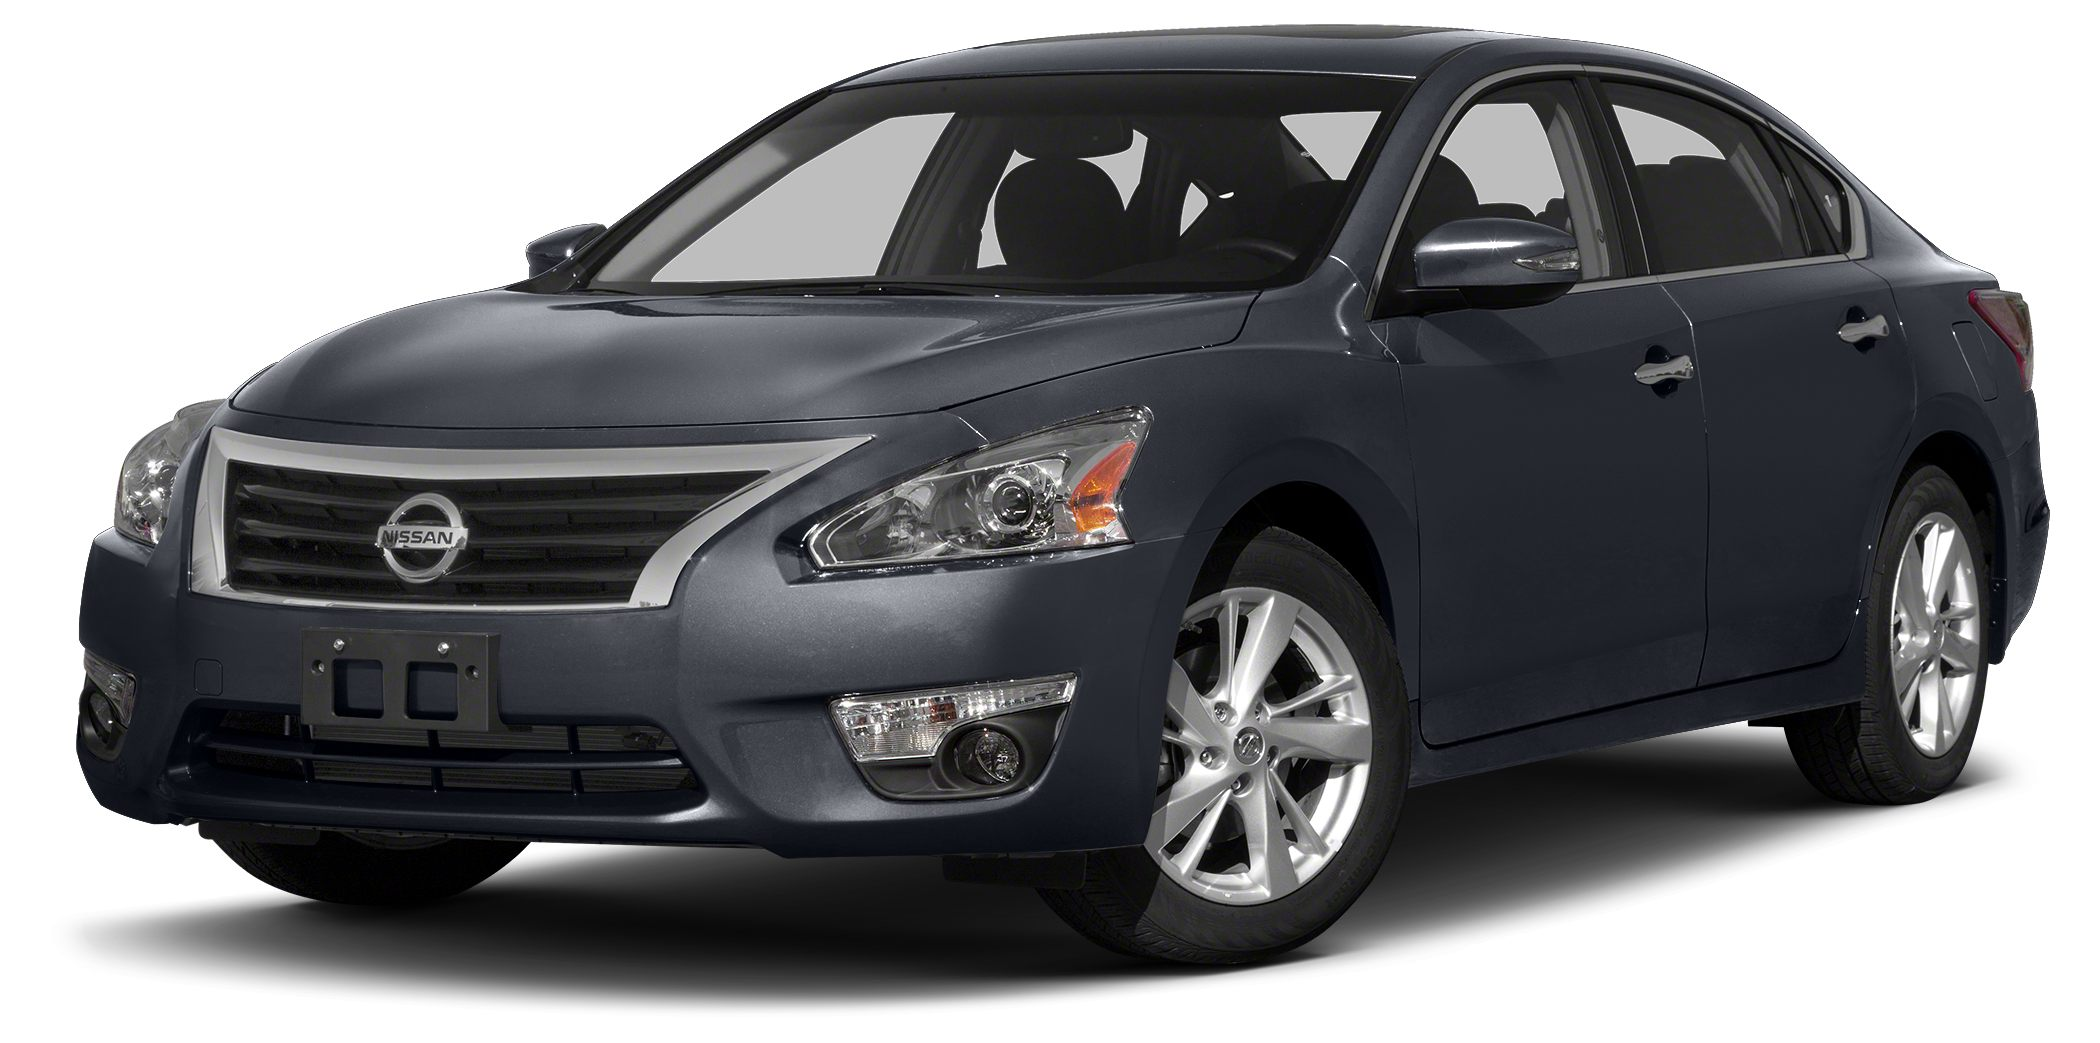 2014 Nissan Altima 25 SL Miles 35884Color Storm Blue Stock PN17164 VIN 1N4AL3AP3EC426110